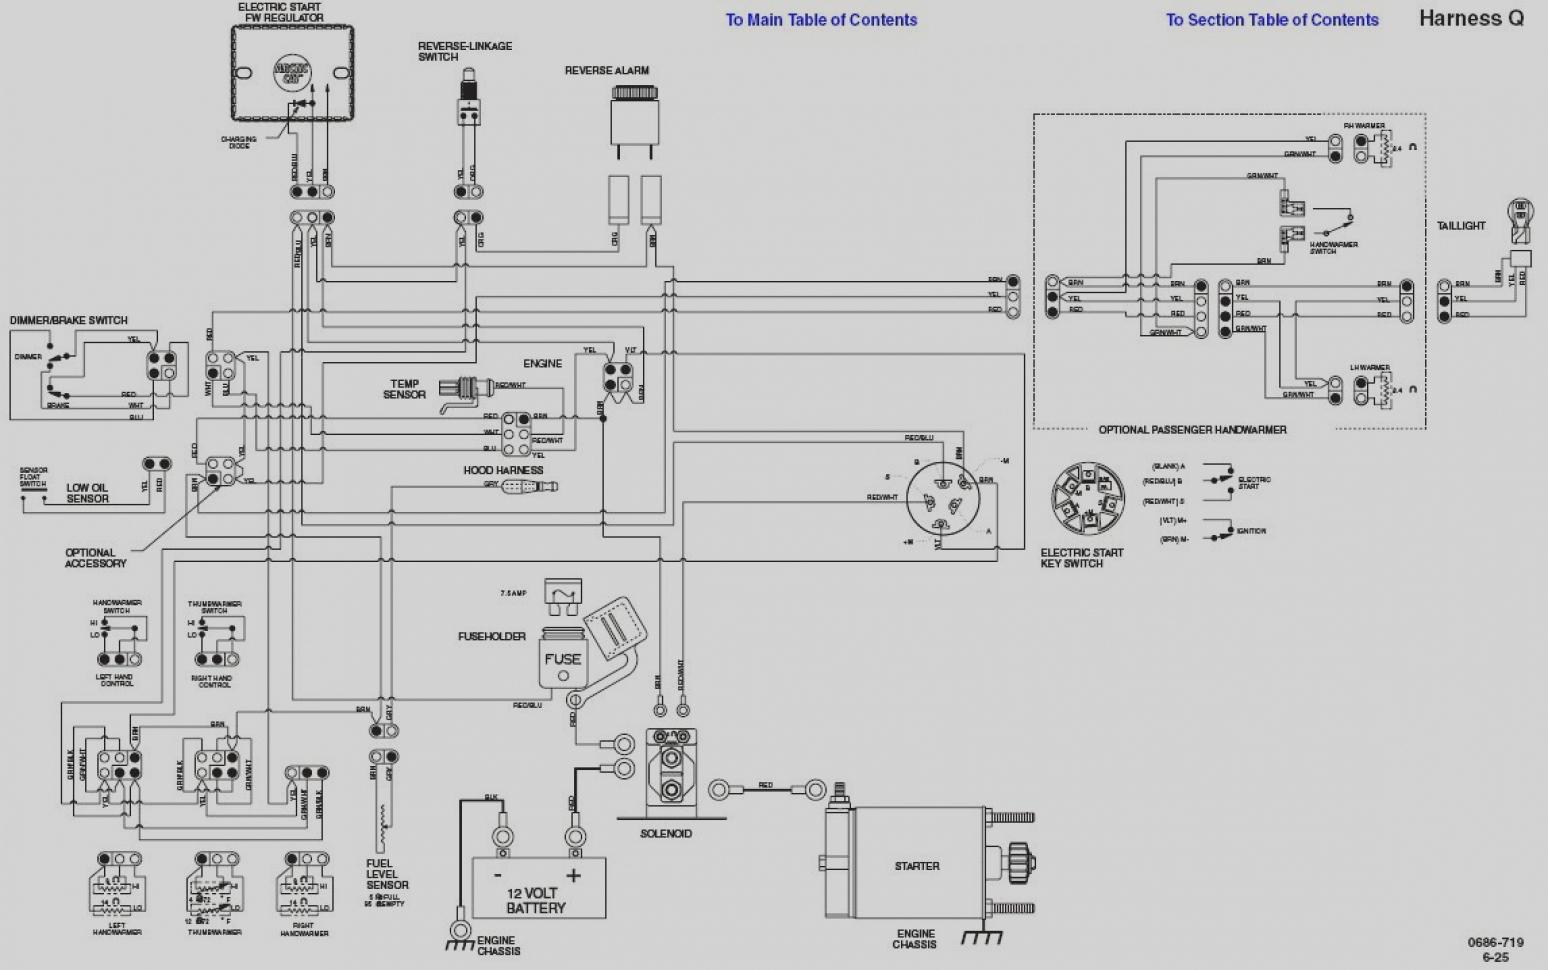 ym_9091] 2012 polaris ranger 800 wiring diagram  icism sand boapu itive arnes tobiq itis barep lite cajos mohammedshrine  librar wiring 101